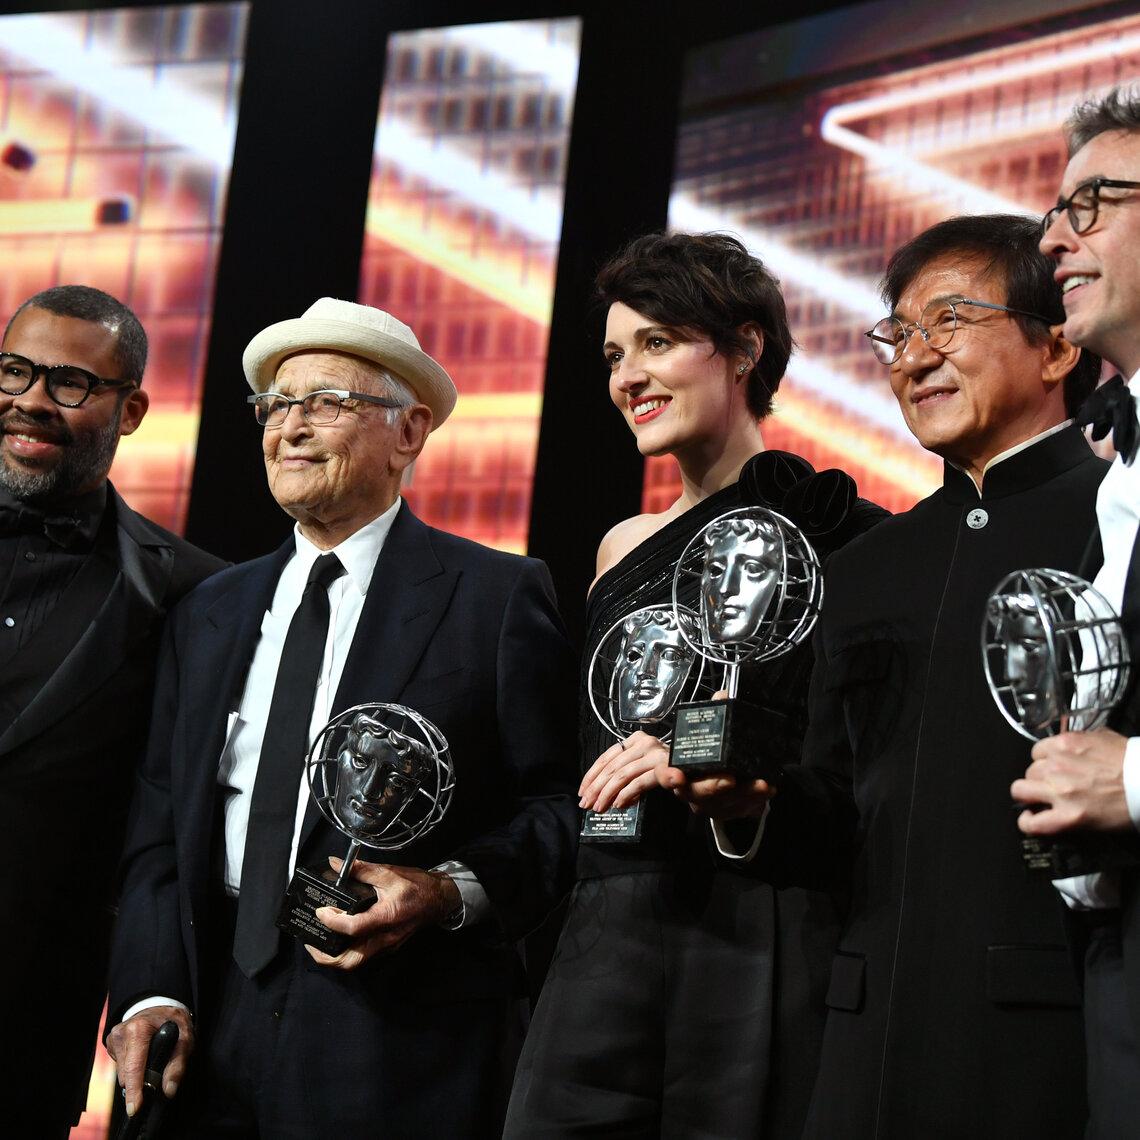 Event: British Academy Britannia AwardsDate: Friday 25 October 2019Venue: The Beverly Hilton, 9876 Wilshire Blvd, Beverly Hills, CA 90210 Host: James Veitch-Area: